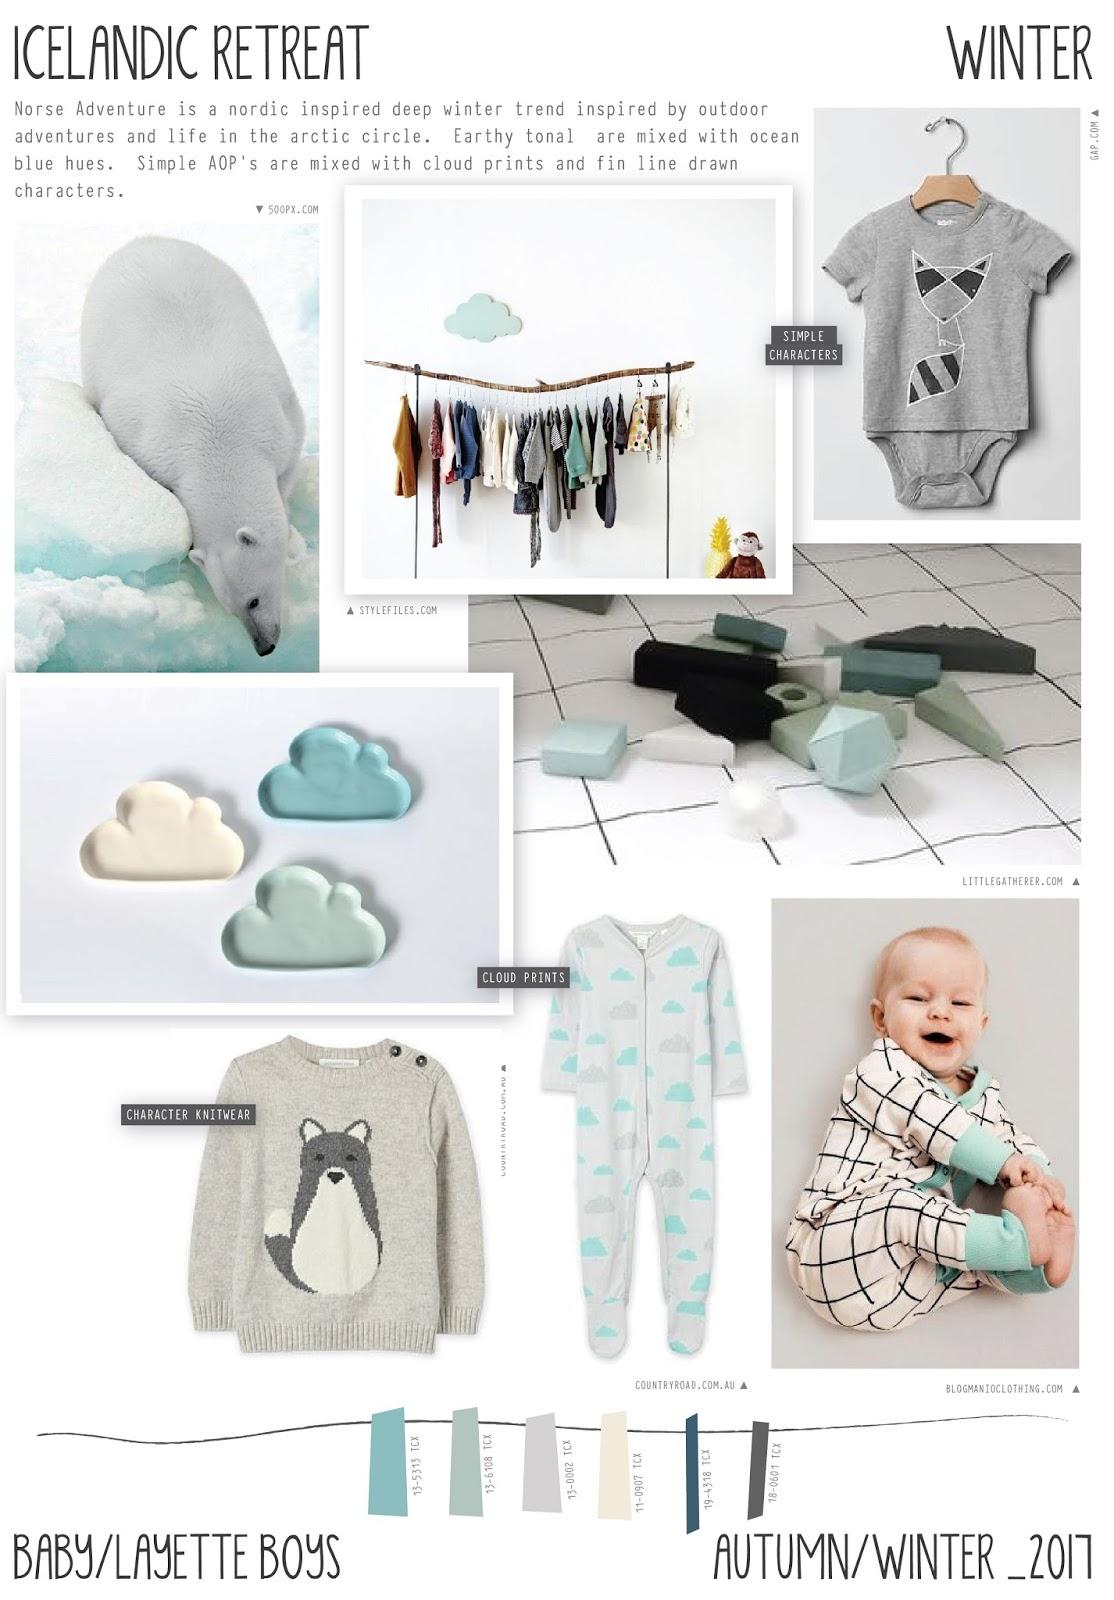 Summer 2017 fashion forecast - Emily Kiddy Icelandic Retreat Autumn Winter 2016 17